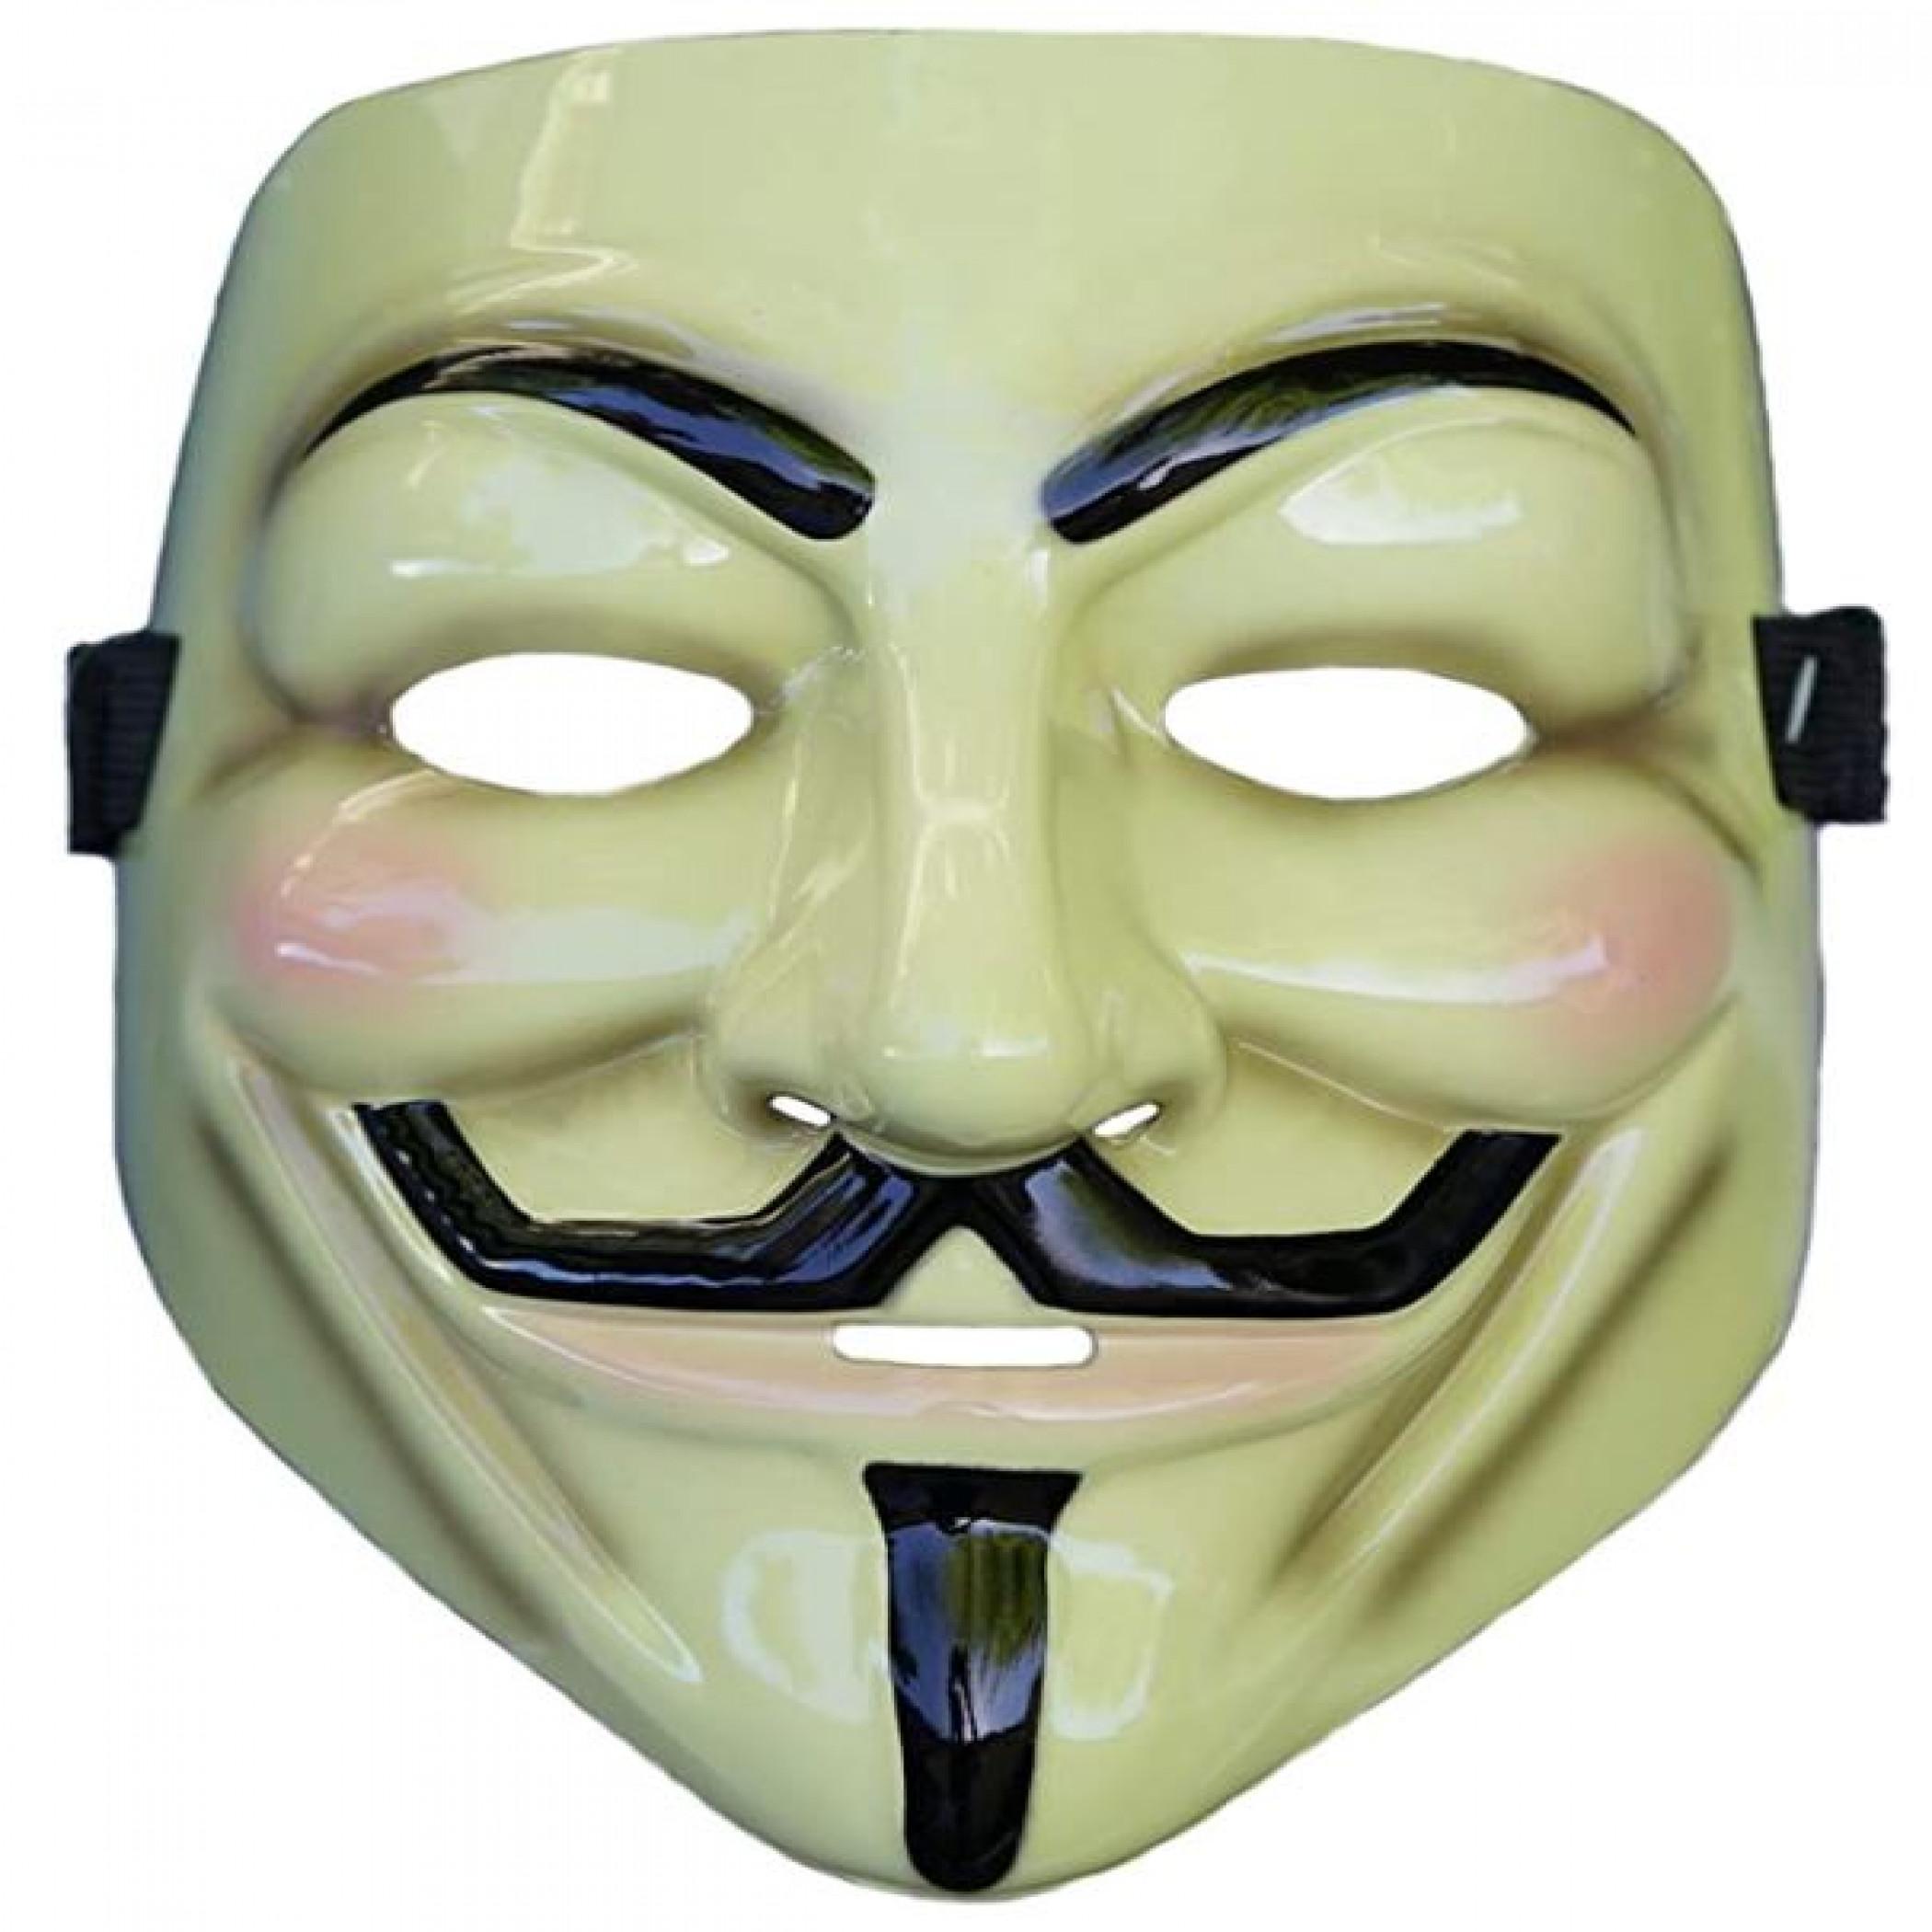 V For Vendetta Collector's Edition Costume Mask